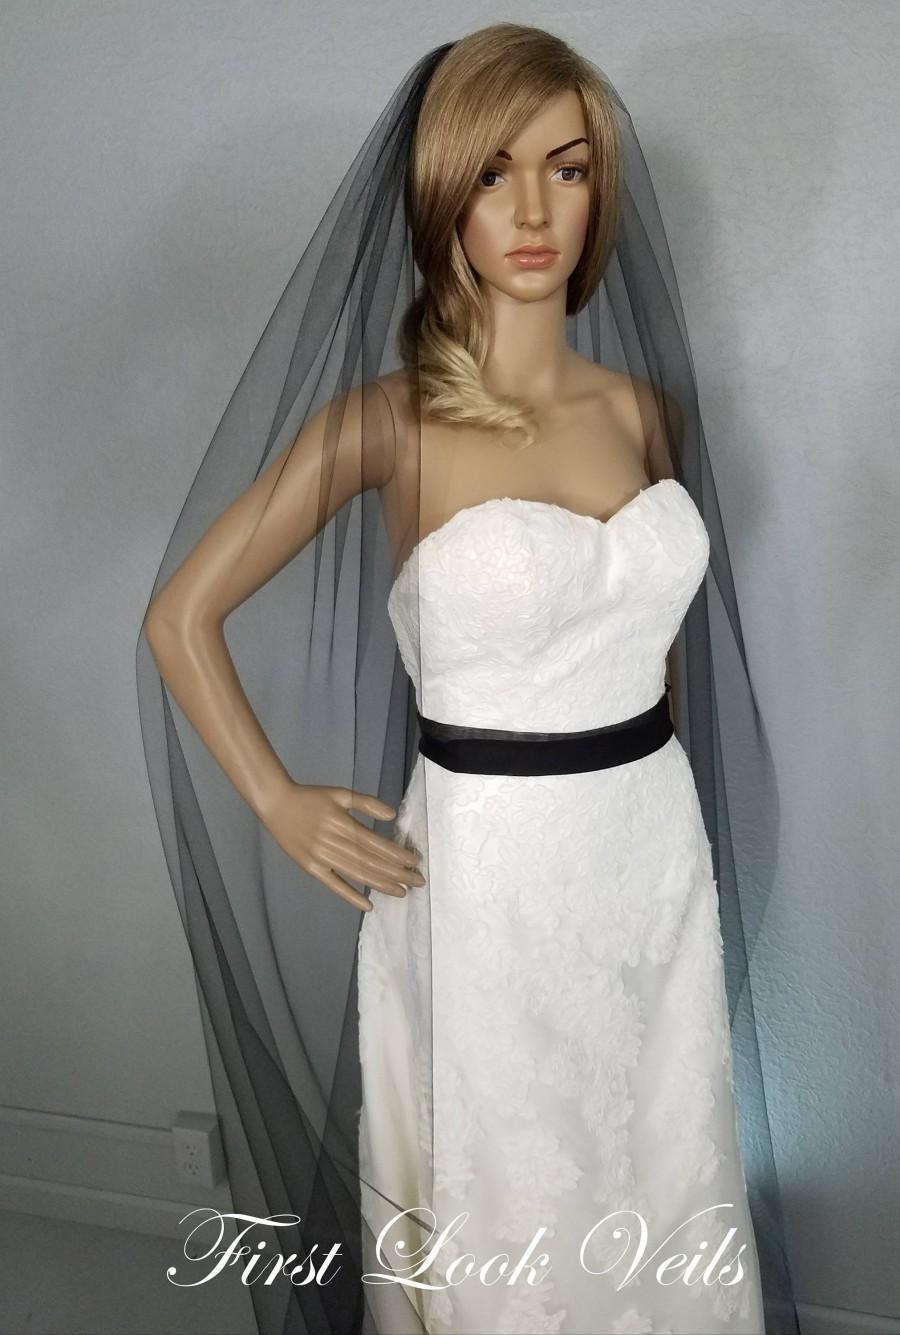 Wedding - Black Veil, Black Veil Brides, Cathedral Vail, Long Vale, Floor Length Veil, Simple Veil, Soft Veil, Tulle Veil, Chapel Veil, Elbow Veil